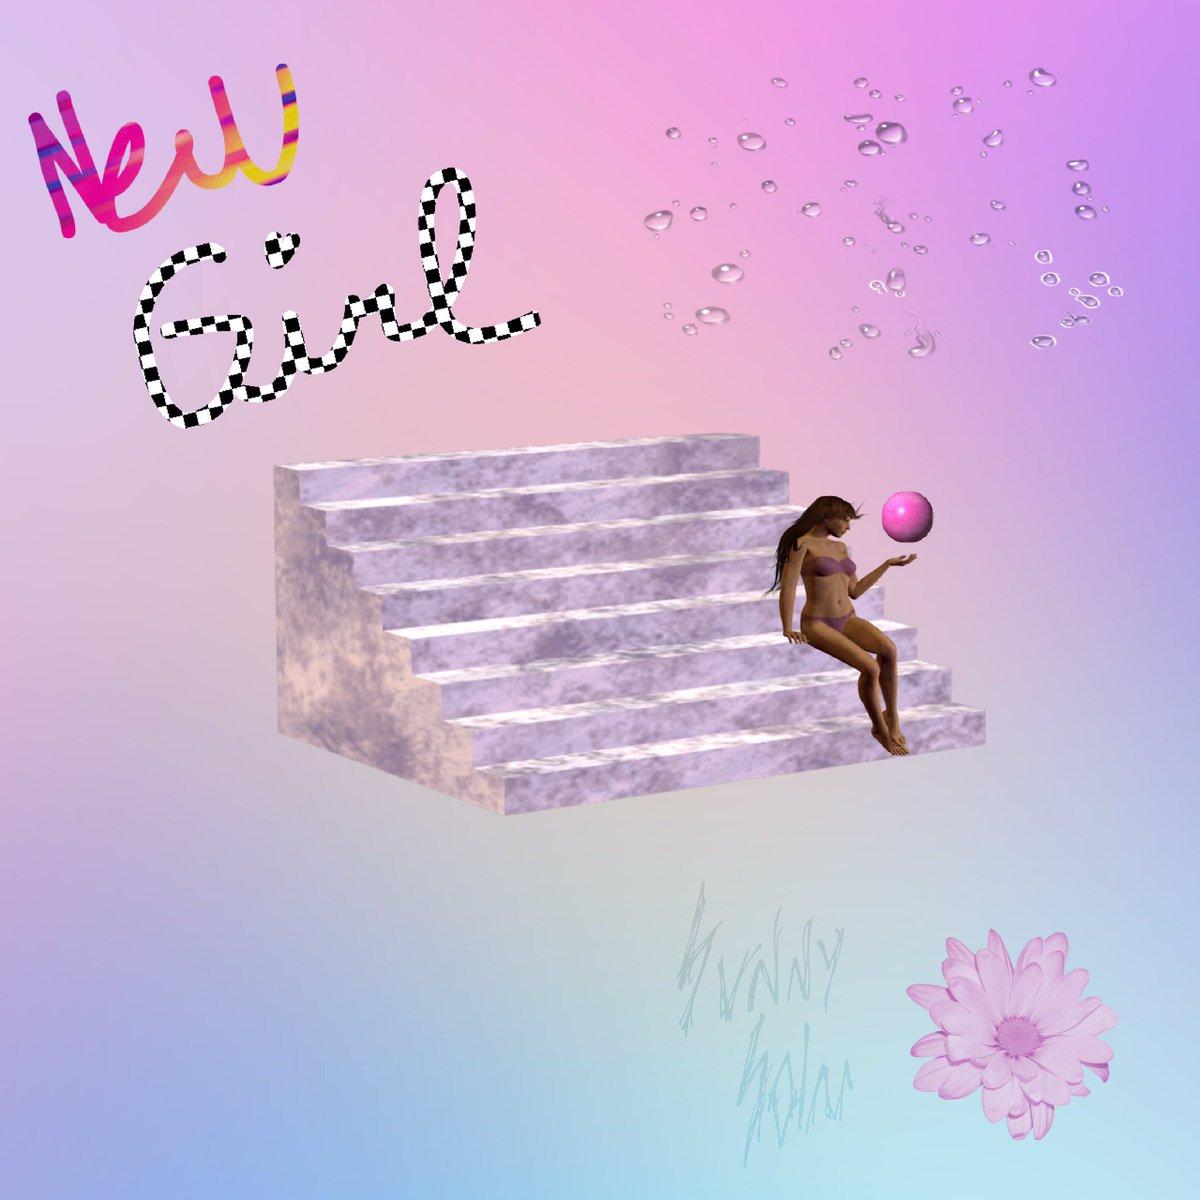 Here's the first single *NEW GIRL* https://t.co/cNzwByz4KI ✨ Artwork/Production By Sunny Solar https://t.co/QaEYgIoxPF